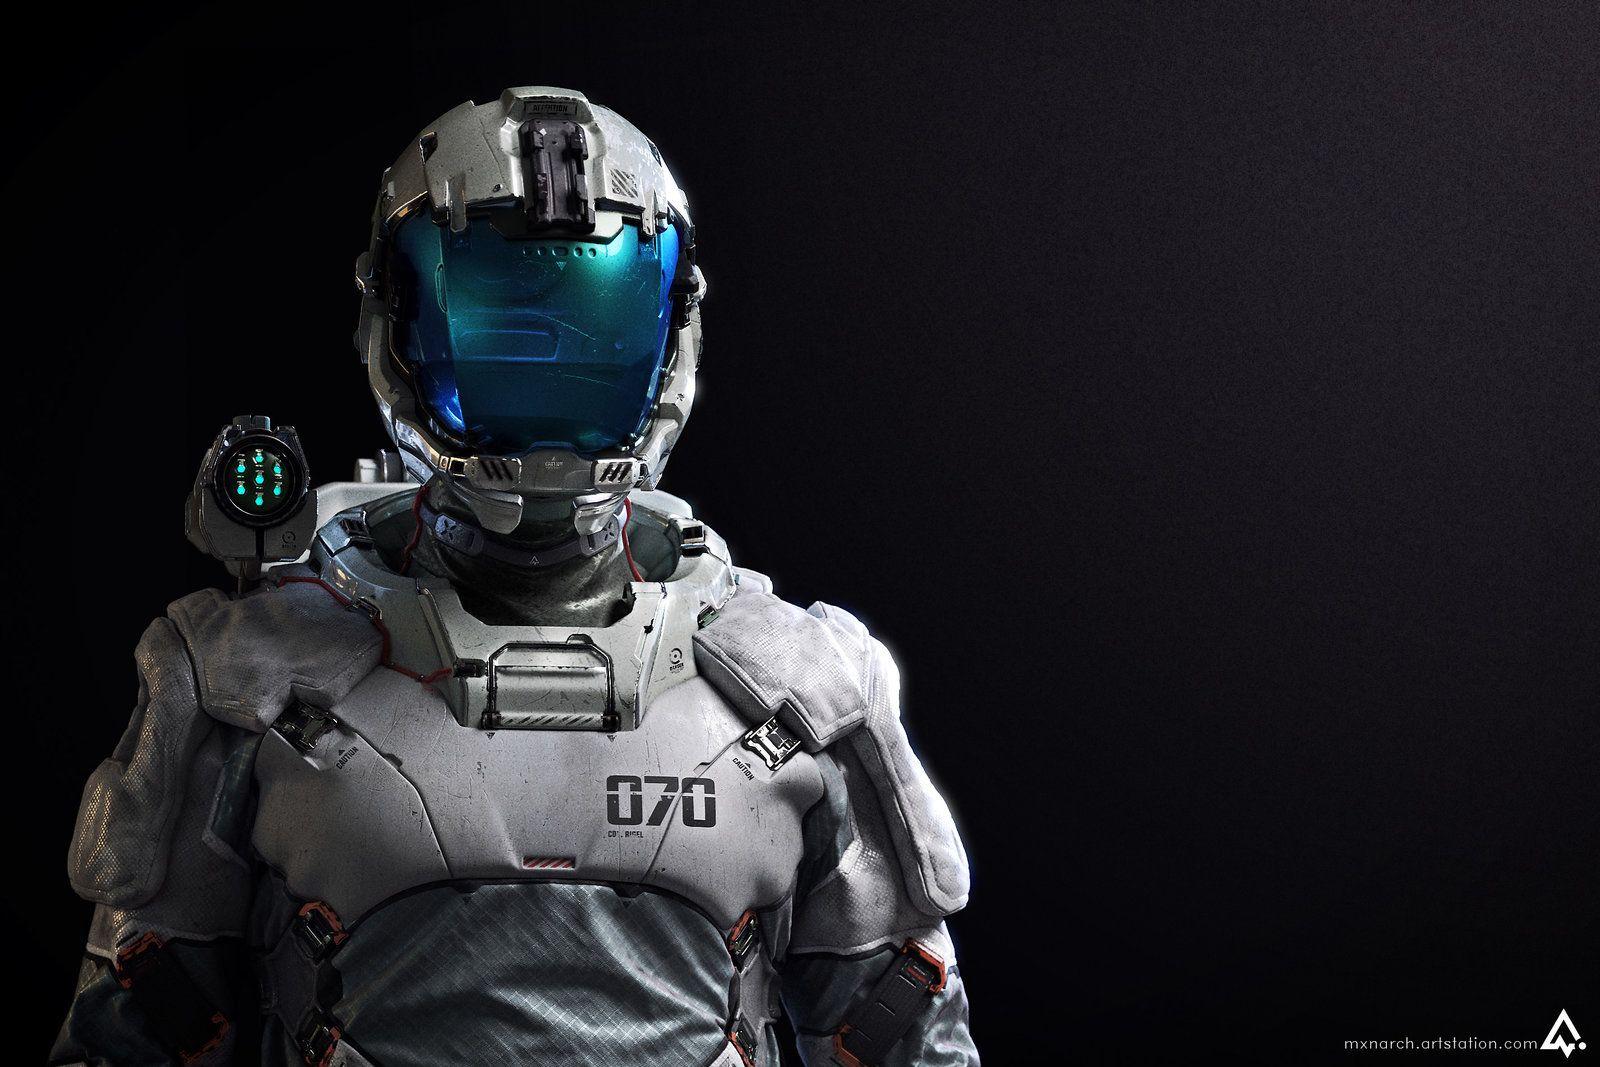 Col. Rigel (Lightweight EVA suit) Detail Shots, Chris Chui on ArtStation at https://www.artstation.com/artwork/col-rigel-eva-suit